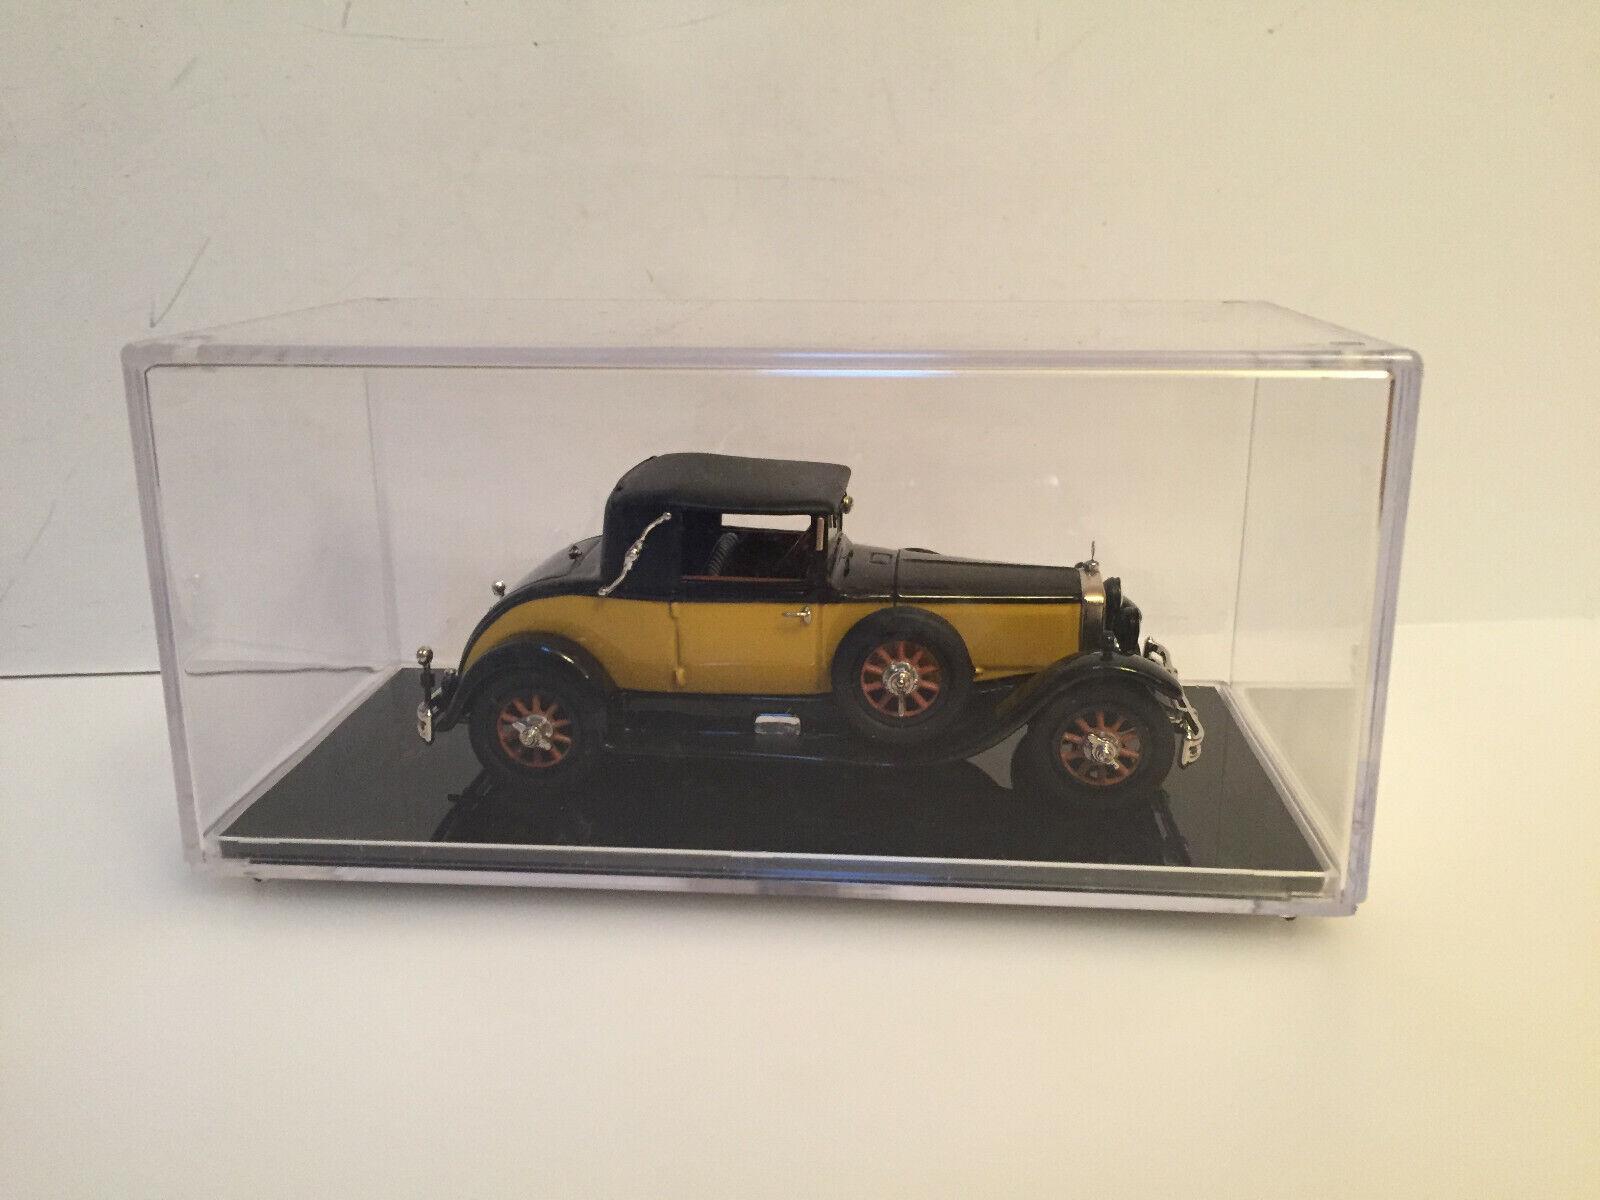 "1 43 1928 MERCEDES BENZ 460 Cabriolet A ""NURBURG   closed Handmade"